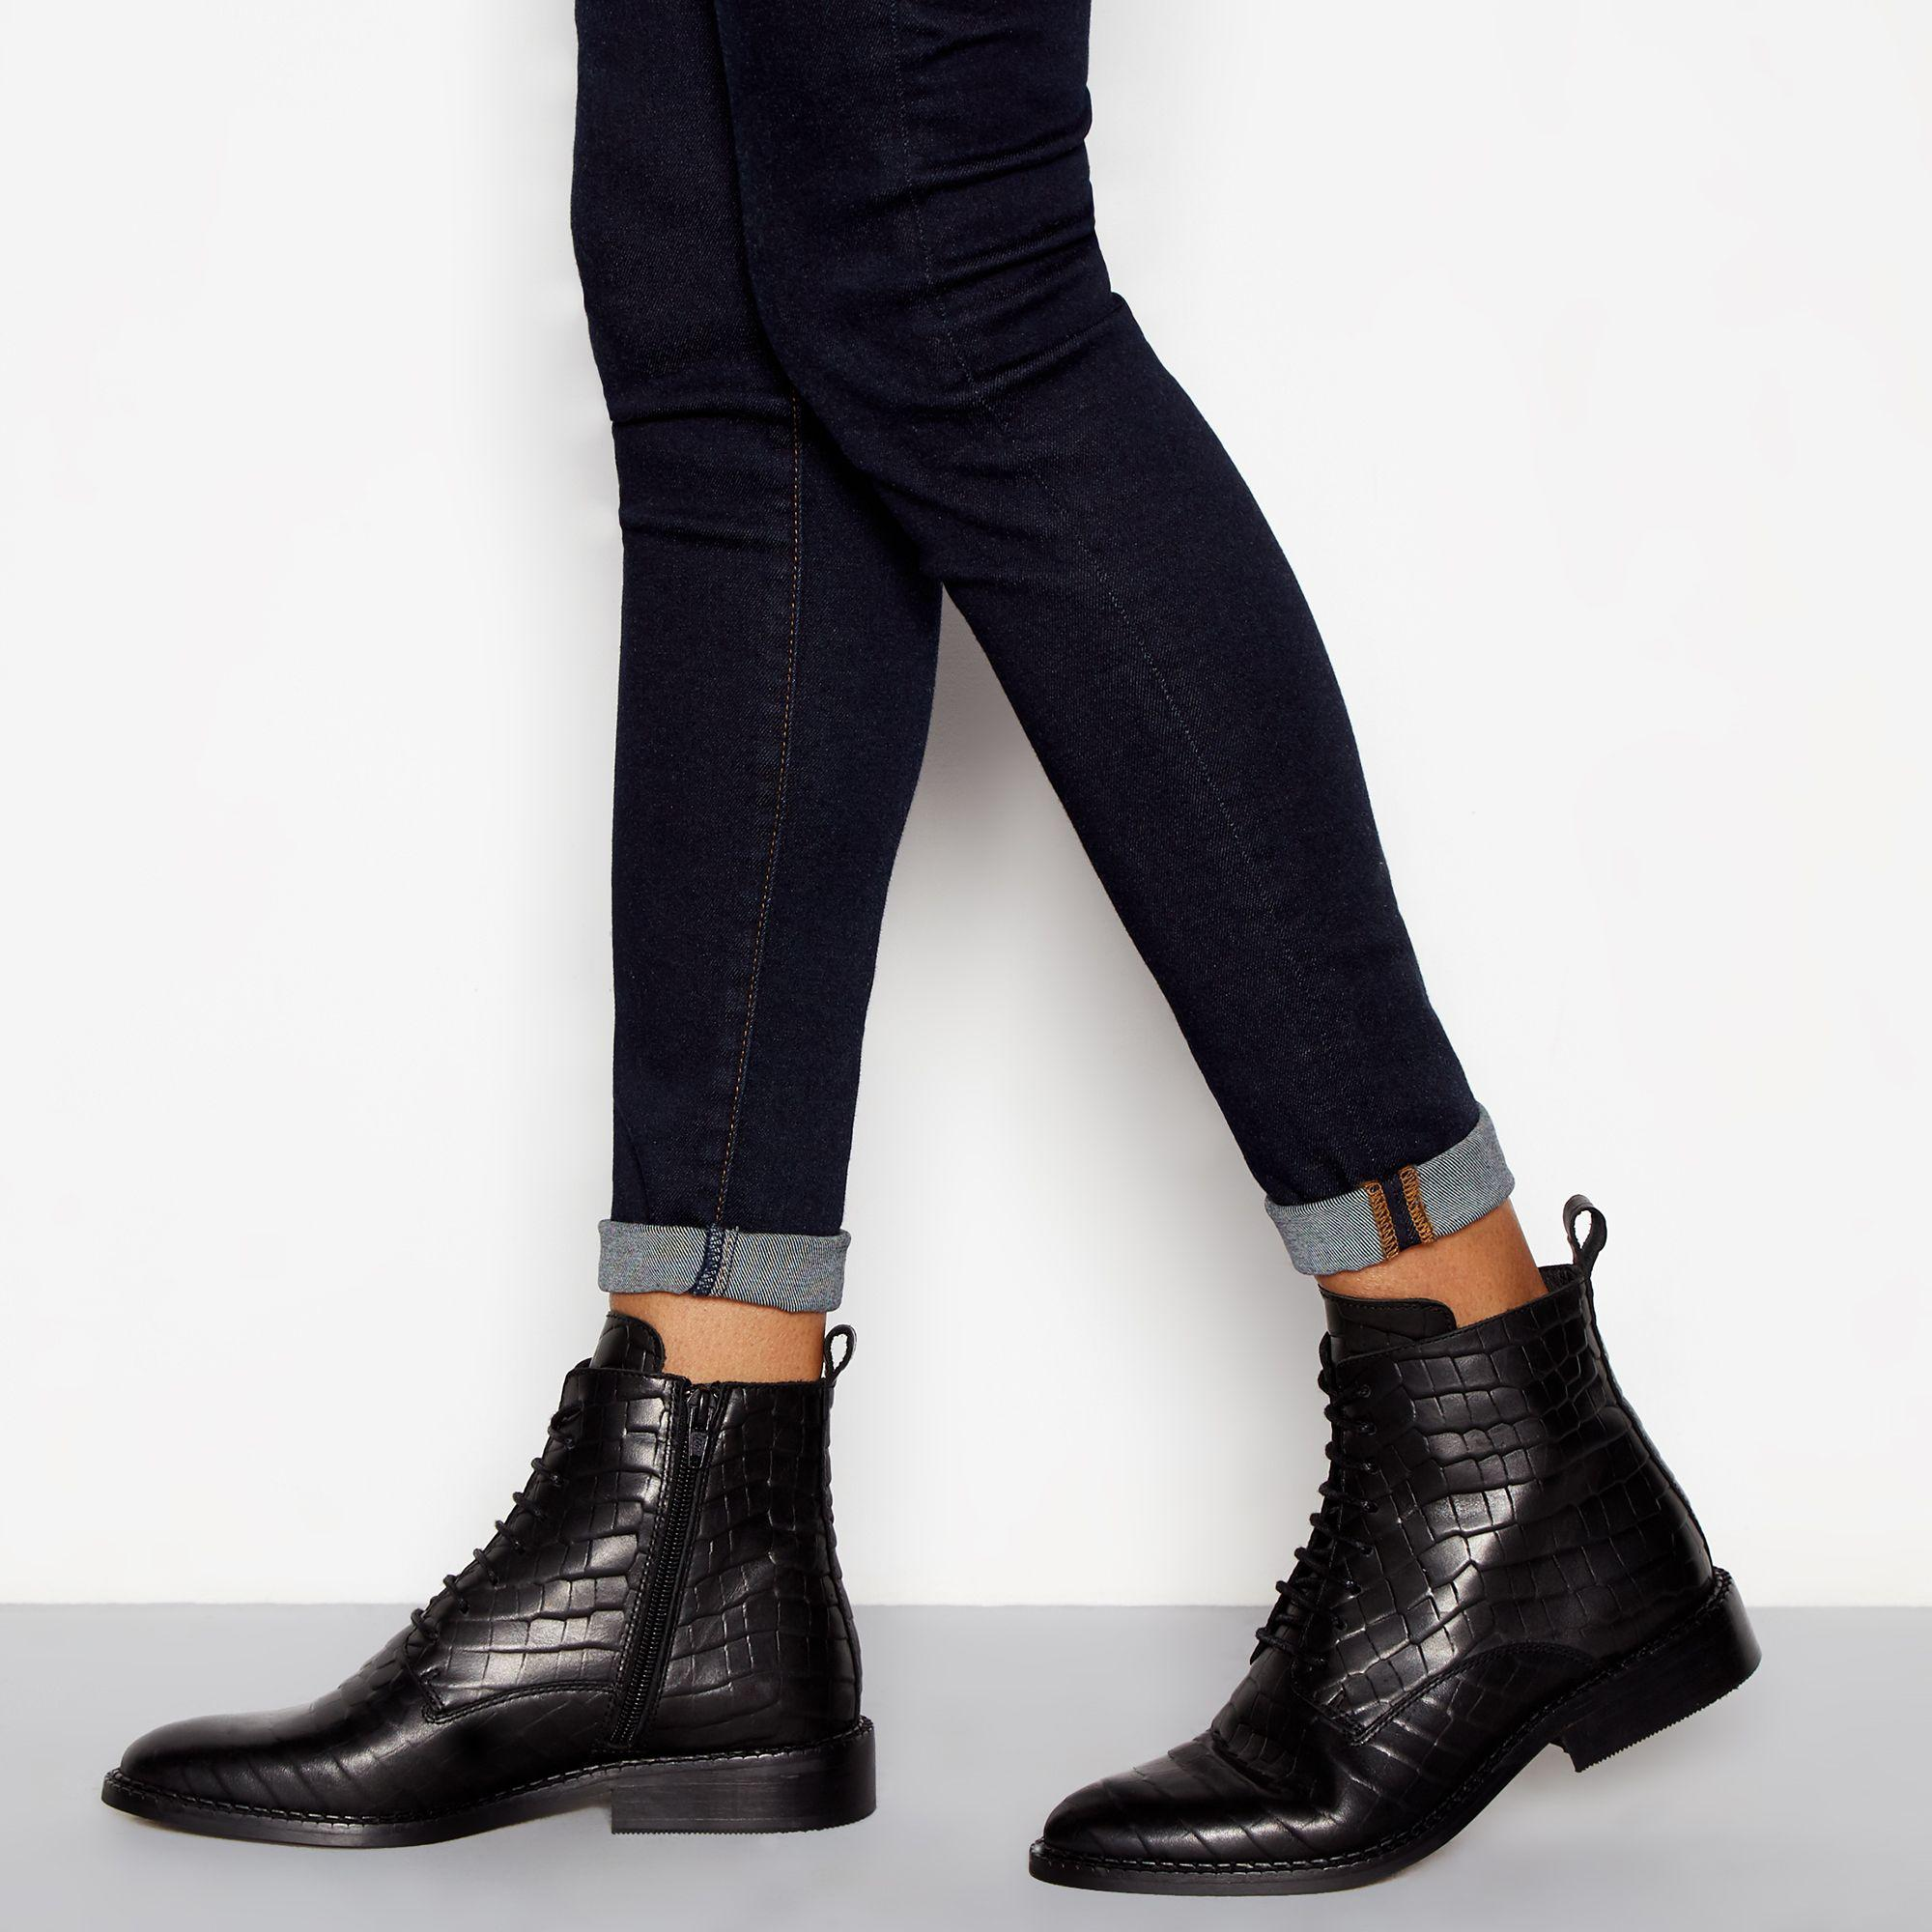 8f47bb15577 J By Jasper Conran Black Leather Croc-effect Lace Up Boots in Black ...